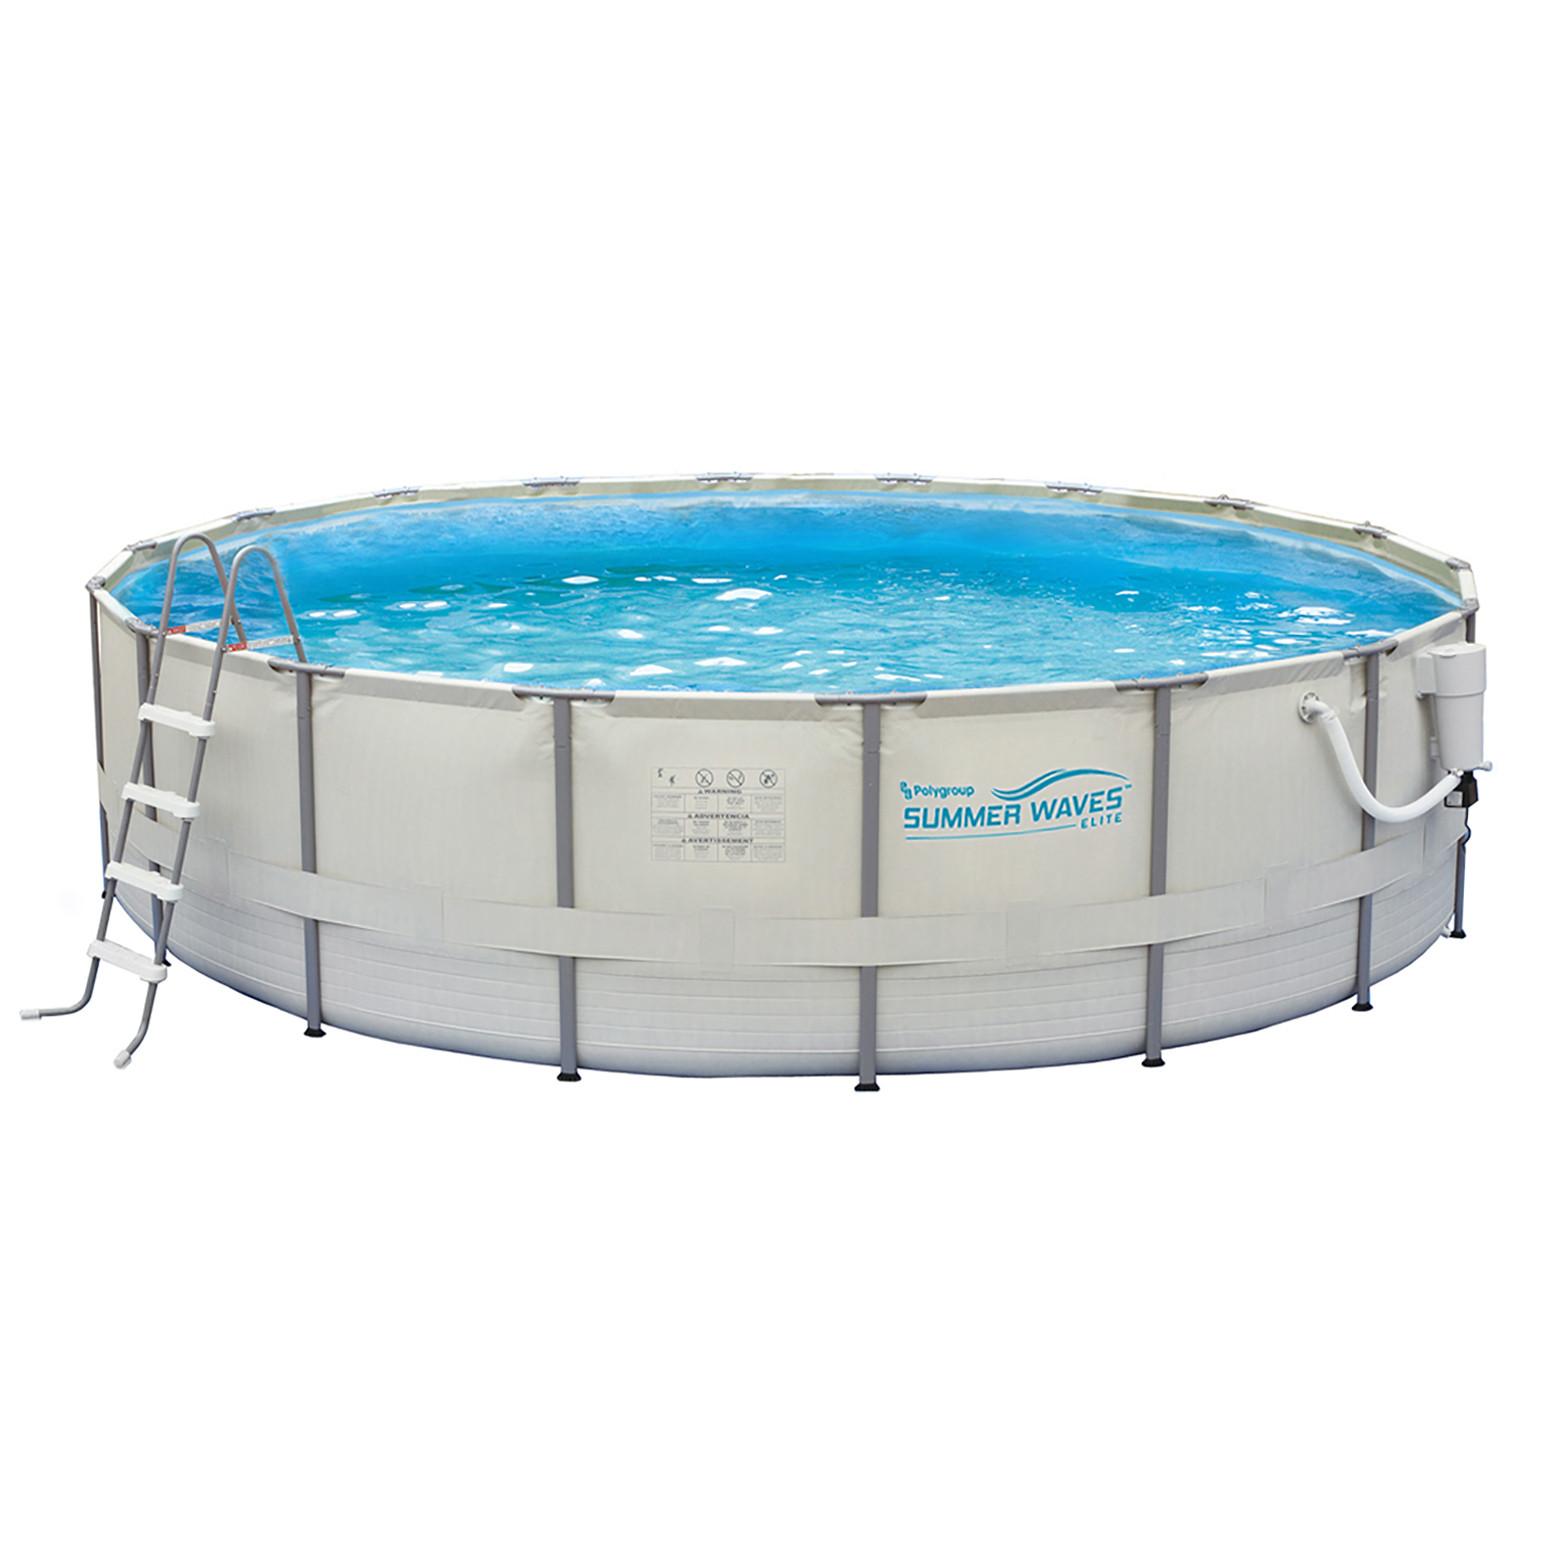 Summer waves 15 39 round 48 depth metal frame pool nb2030 for Pool rund 3 60